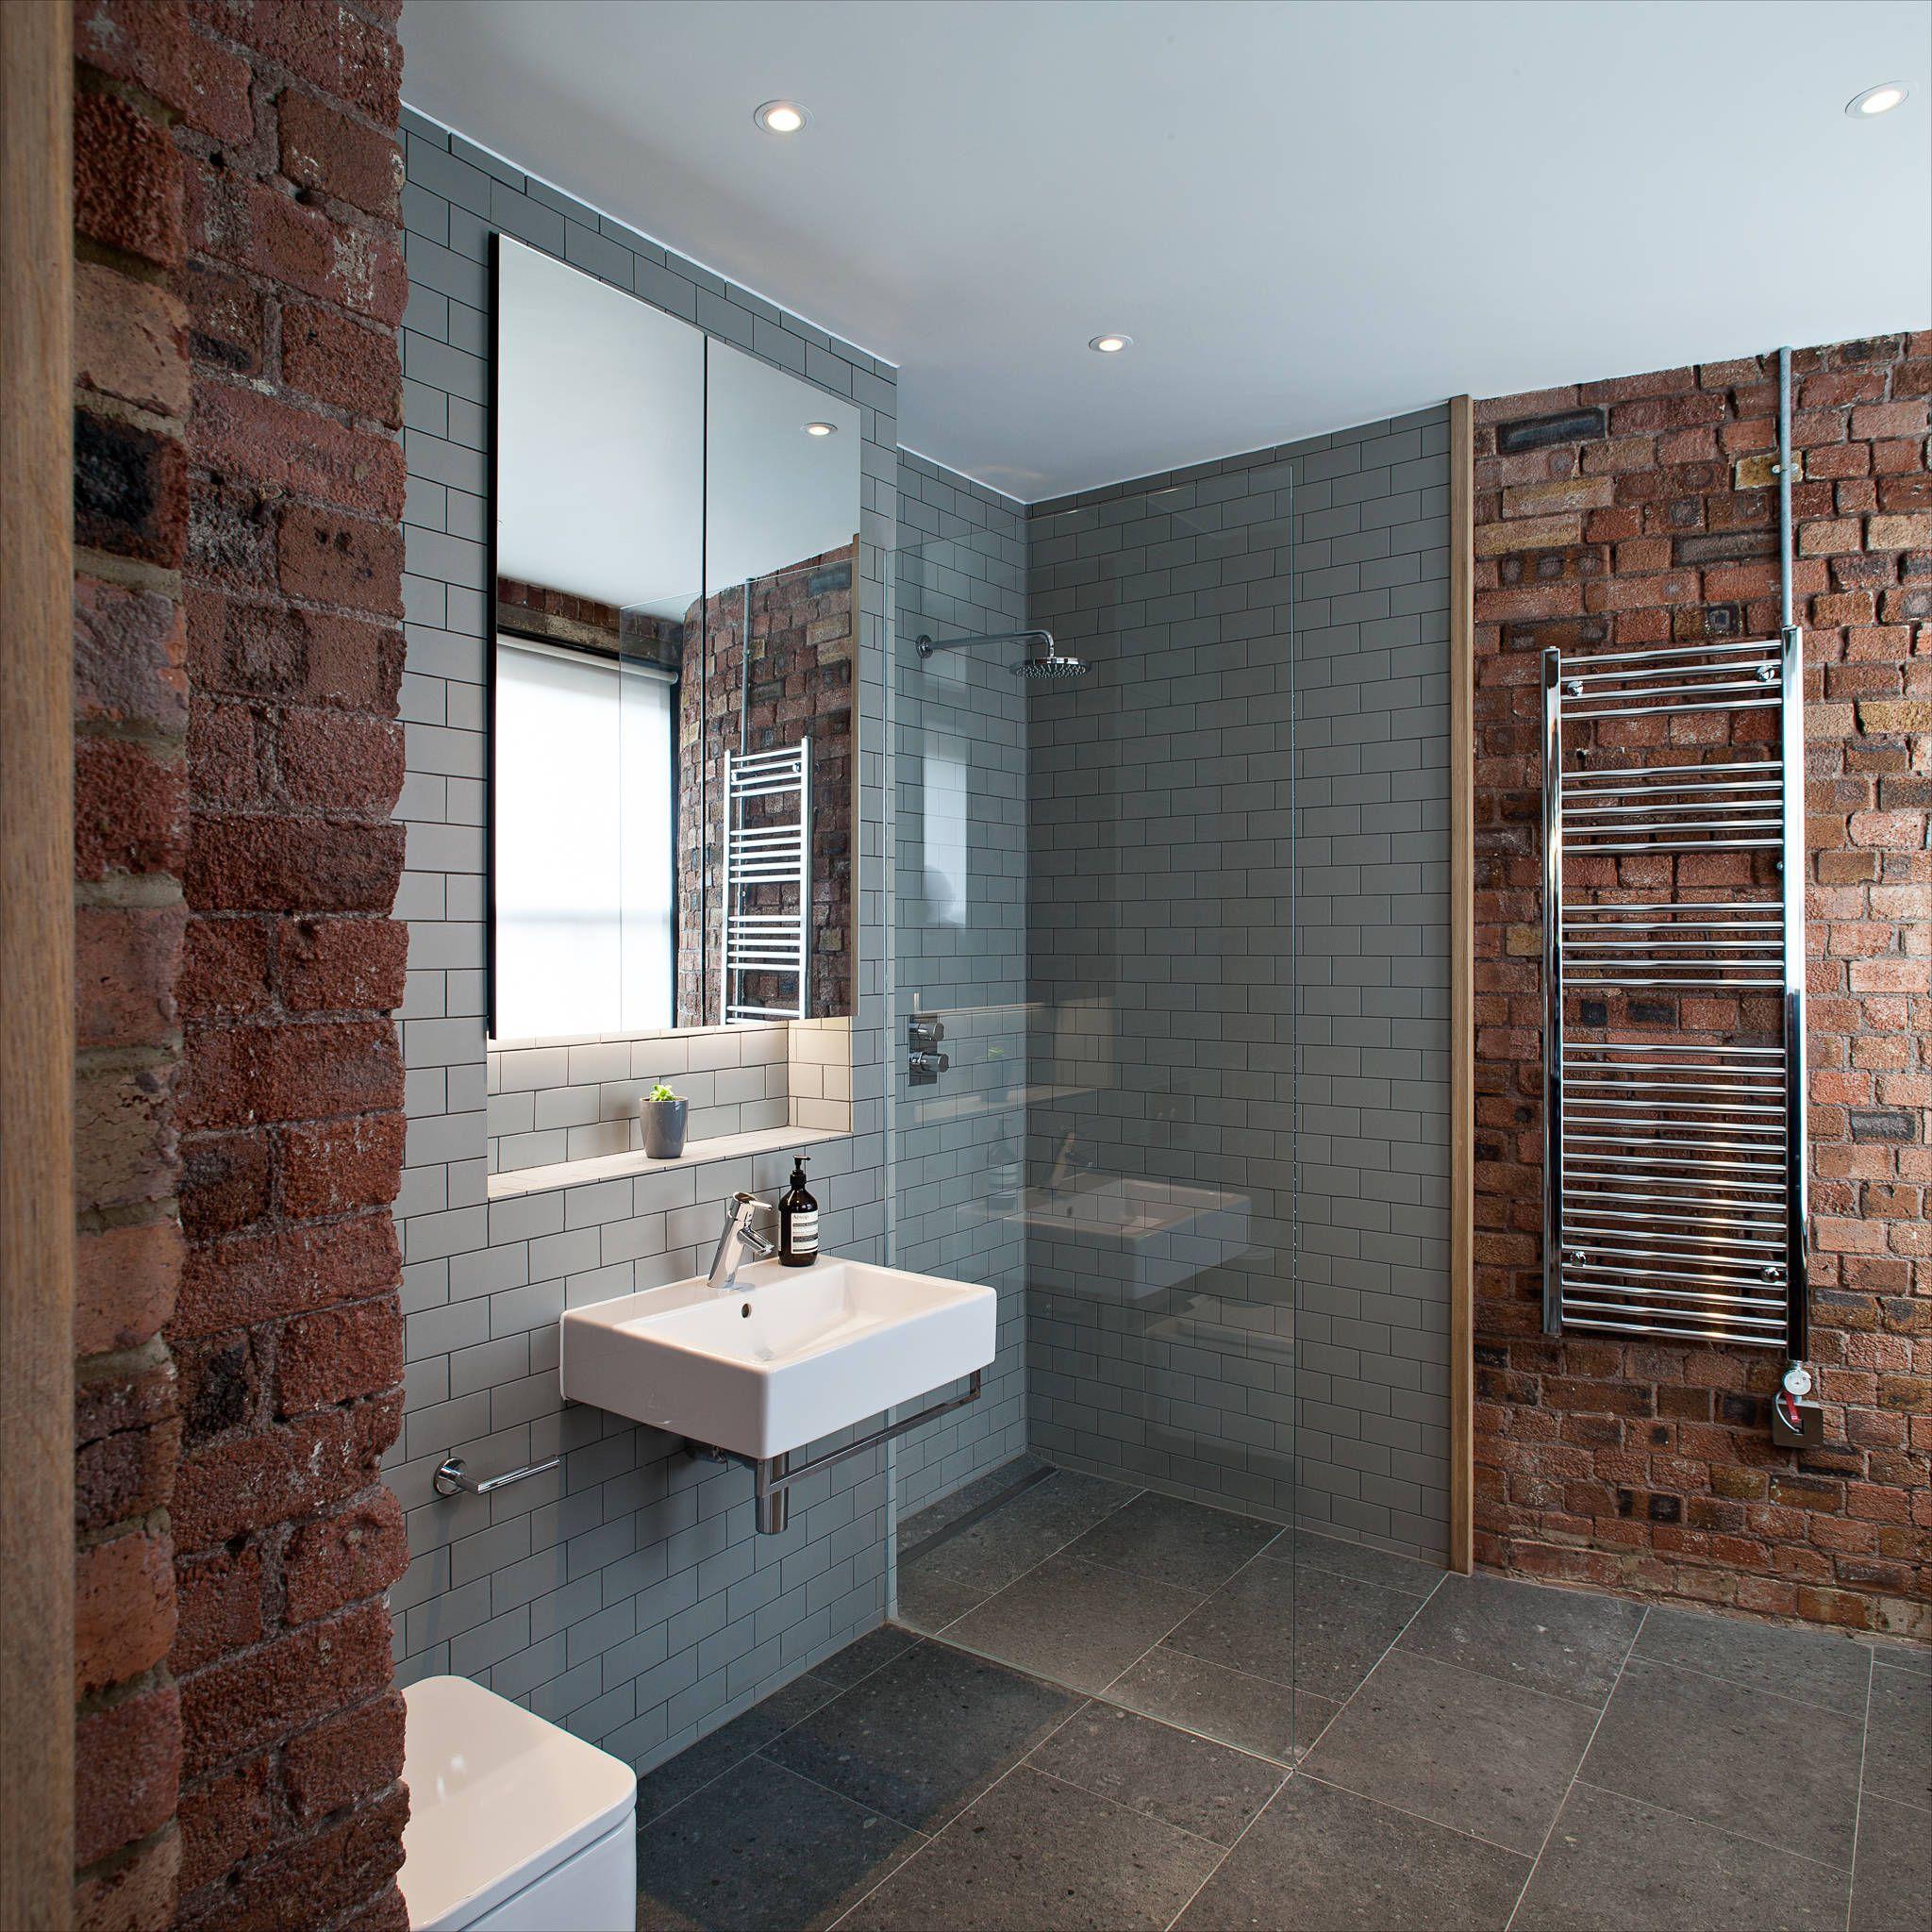 5x8 badezimmer design  best wet room design ideas  townhouse bricks and wet rooms